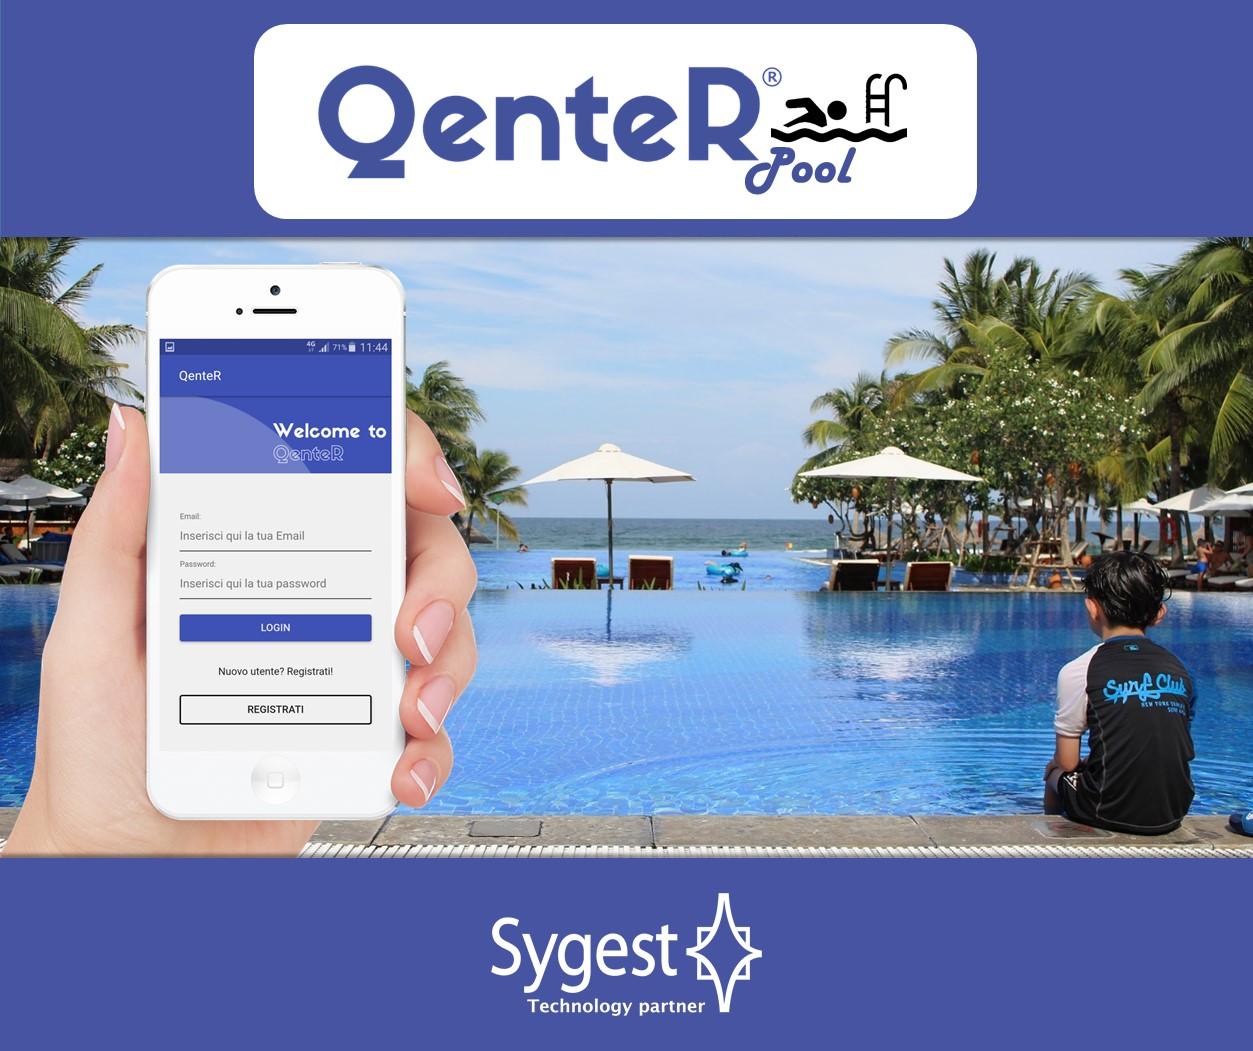 QenteR Pool - App prenotazione piscina | Sygest Srl